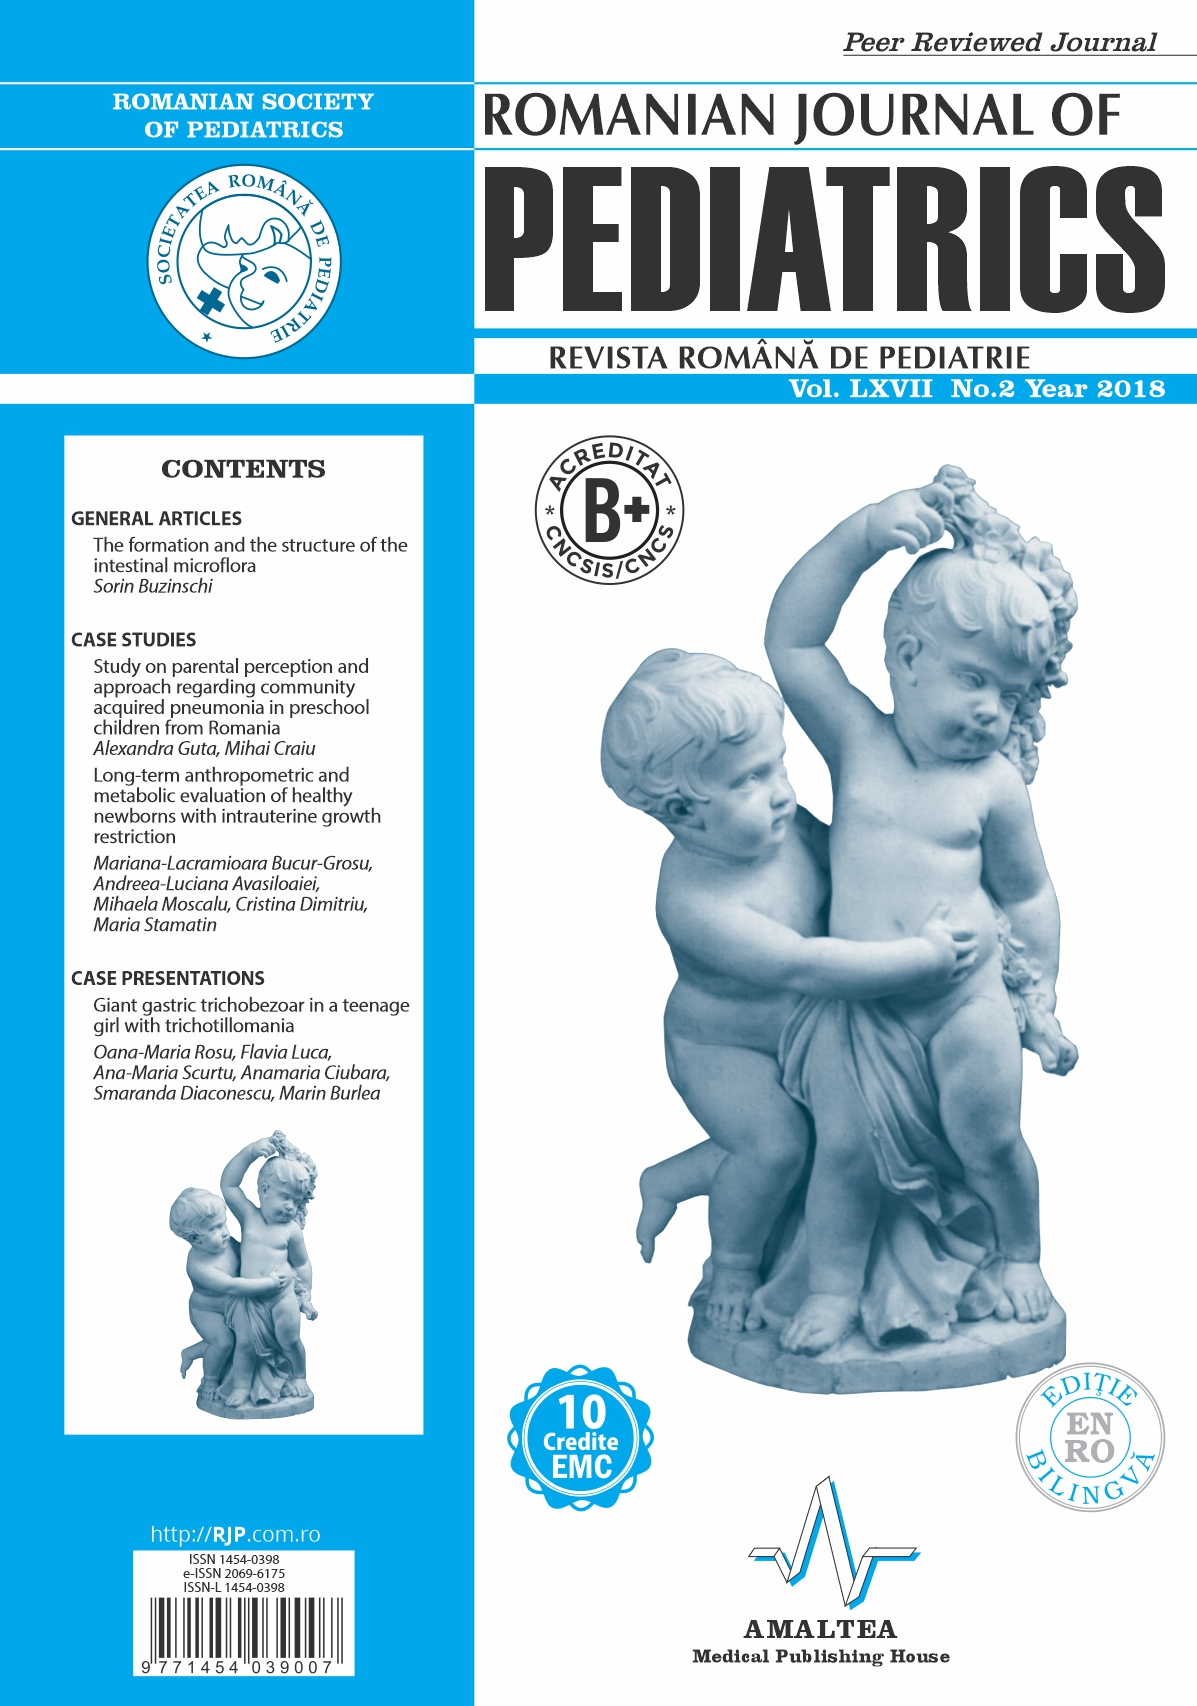 Romanian Journal of Pediatrics | Volume LXVII, No. 2, Year 2018